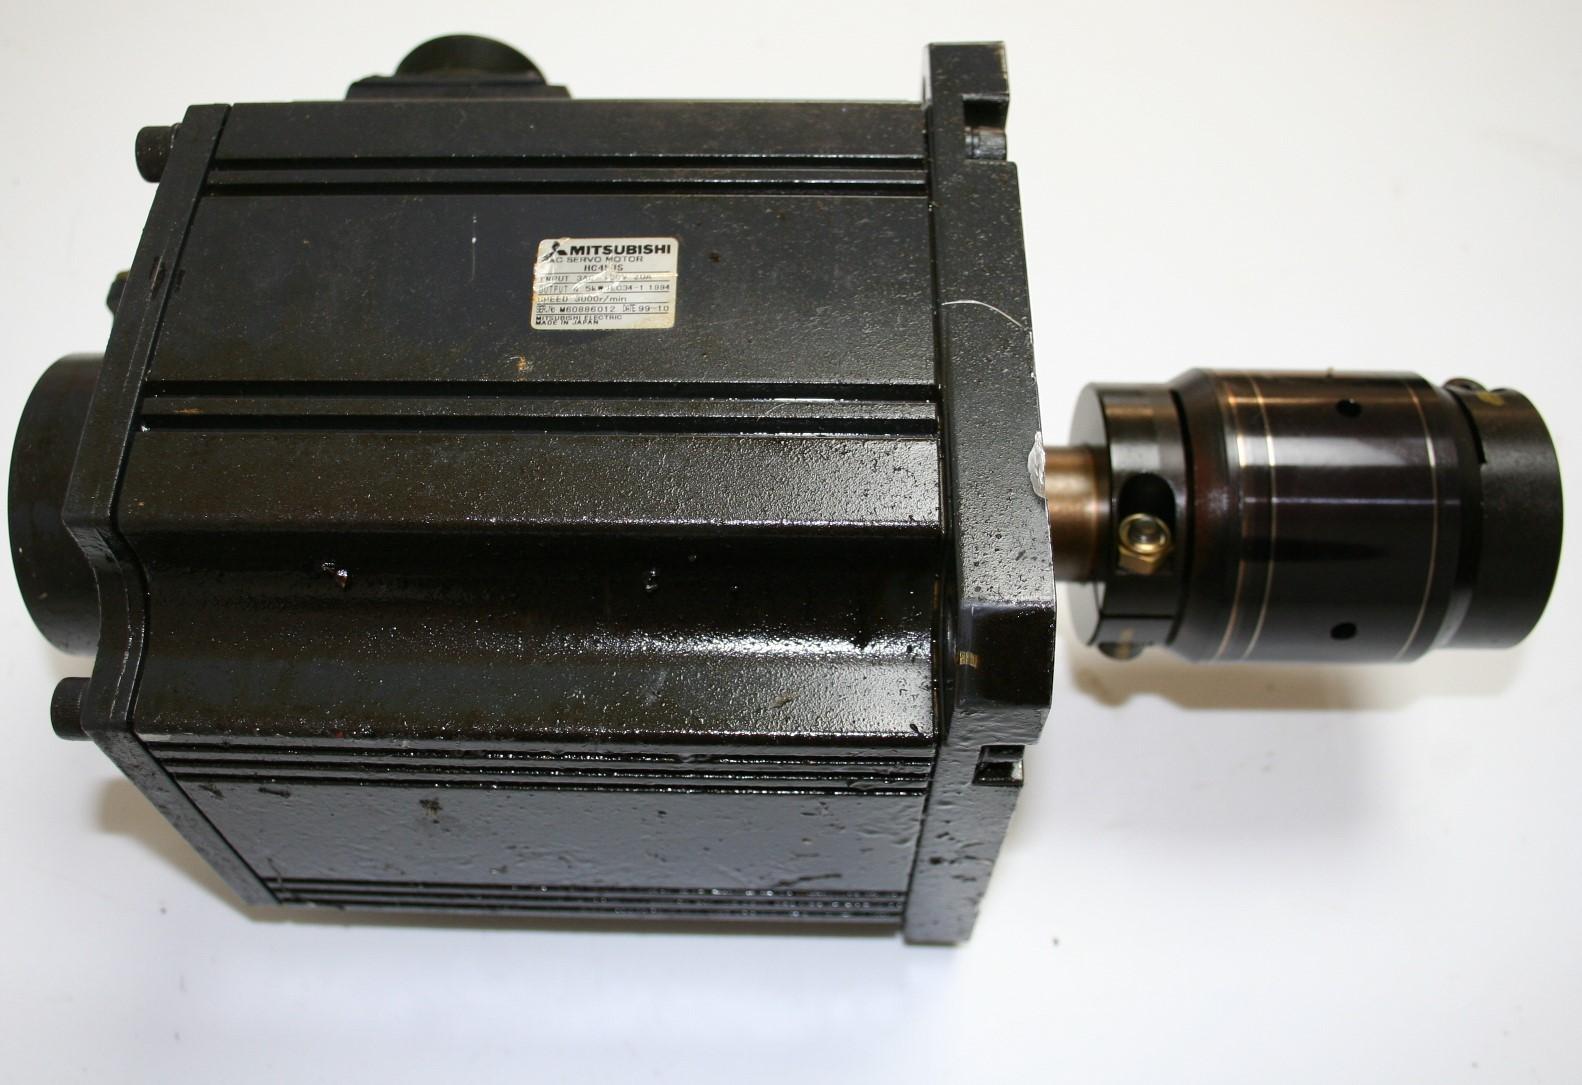 Mazak Mitsubishi HC453S Servo Motor and Encoder (OSE105S2) A